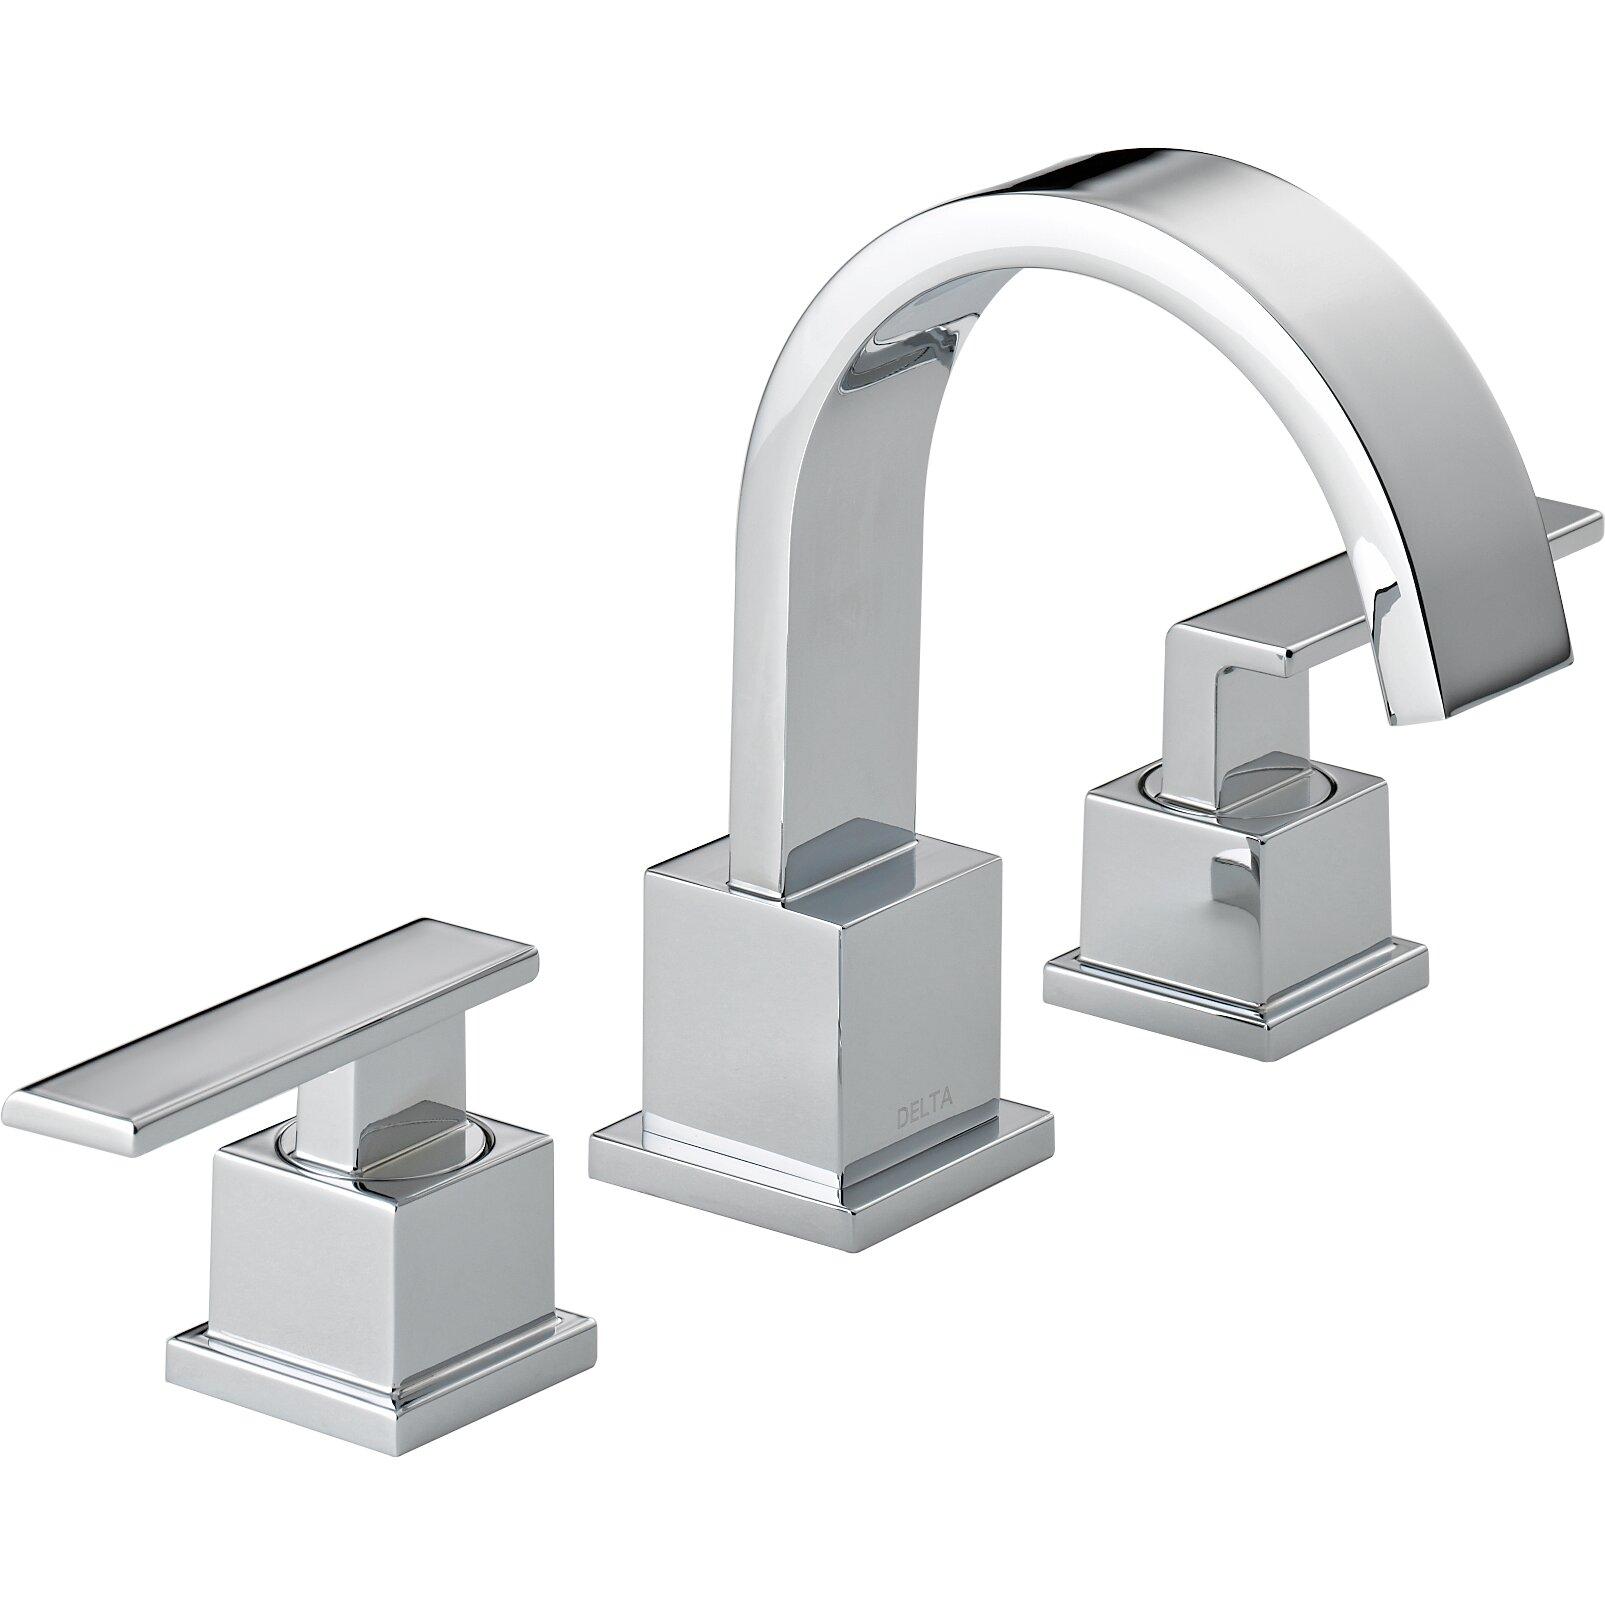 Delta Foundations 35996lf Bn Two Handle Widespread: Delta Vero Two Handle Widespread Bathroom Faucet & Reviews